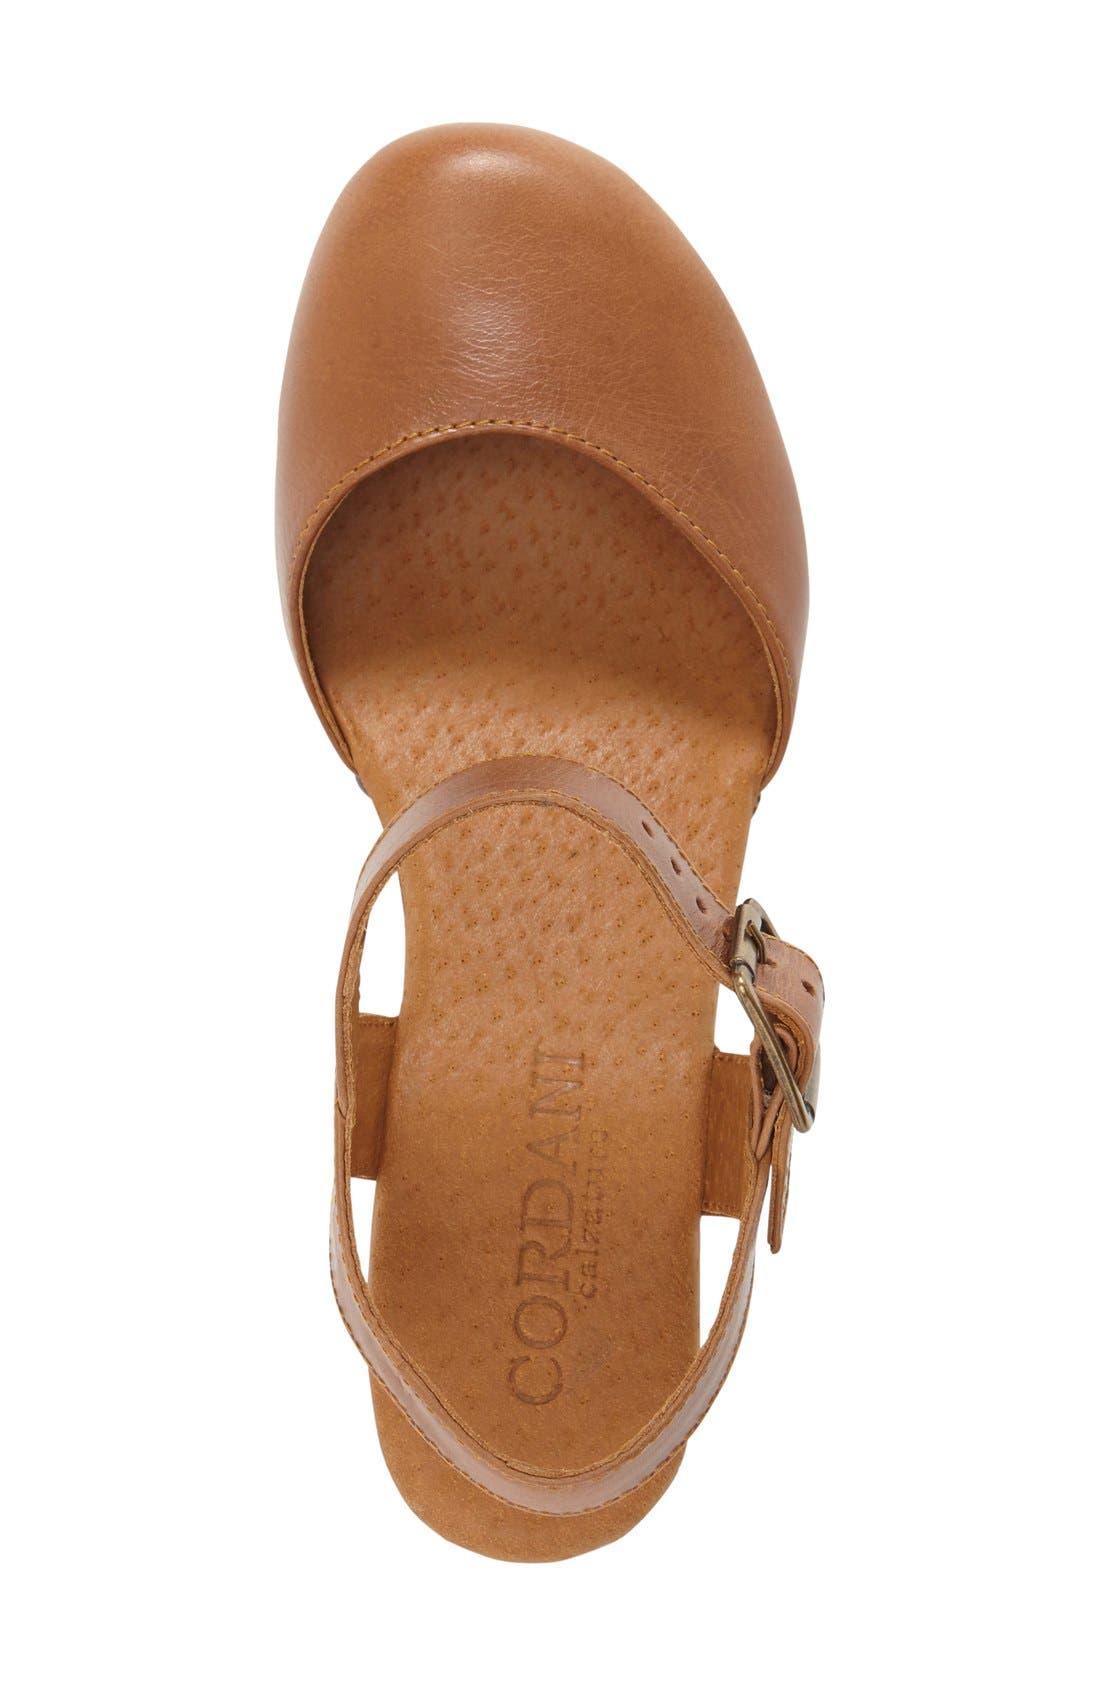 Alternate Image 3  - Cordani 'Zori' Sandal (Women)